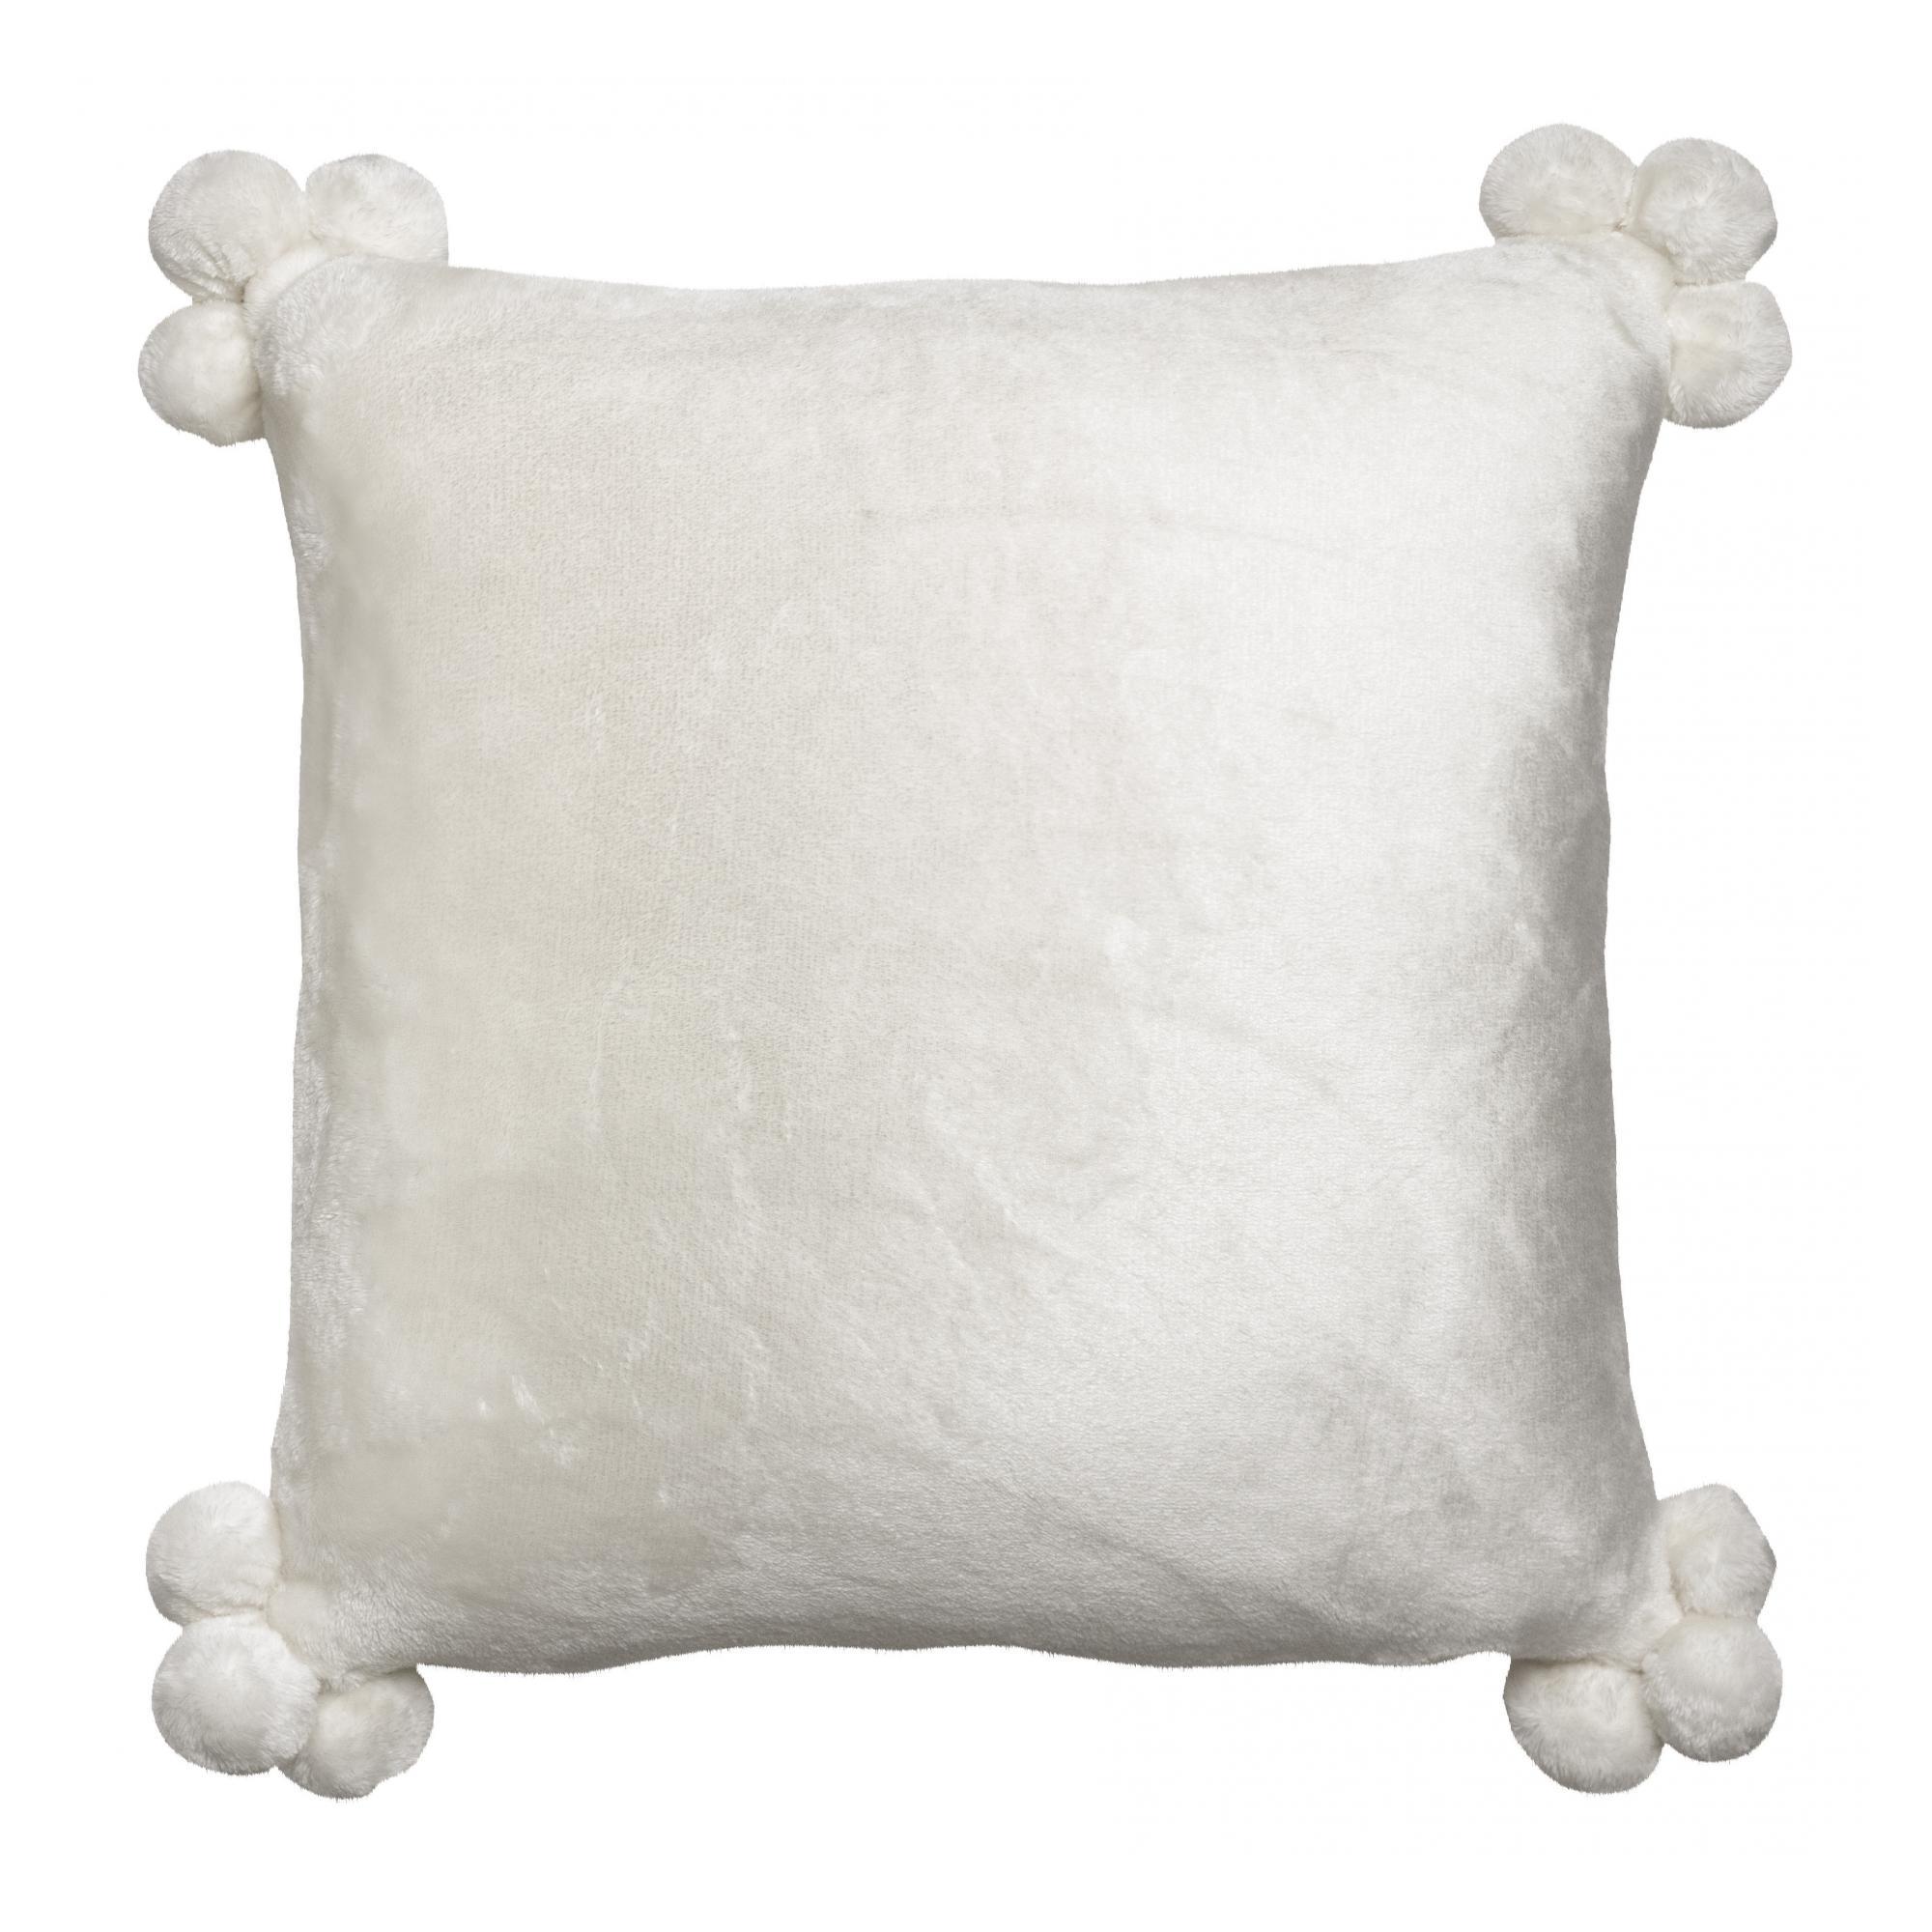 Coussin  pompons en polyester neige 45 x 45